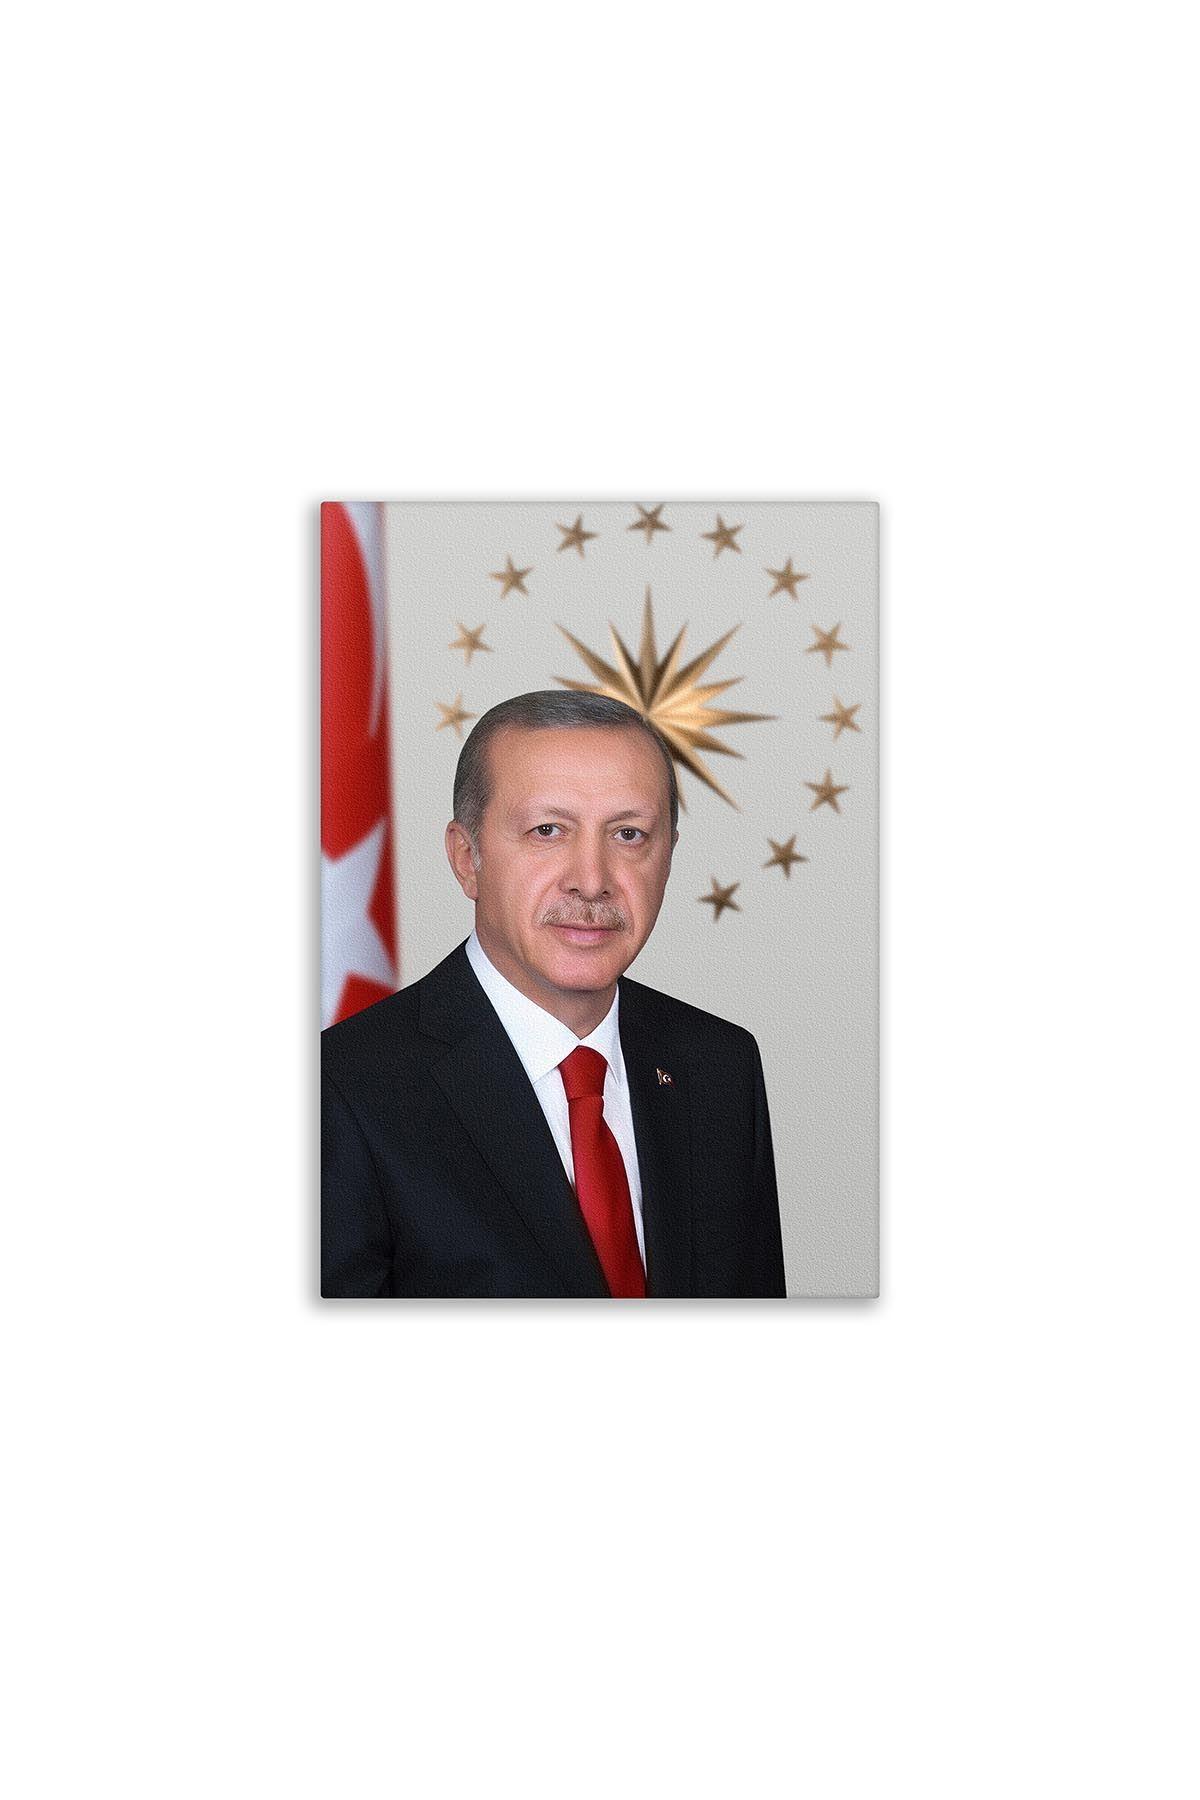 Recepe Tayyip Erdoğan Canvas Board | Printed Canvas Board | Customized Canvas Board | Digital Printing